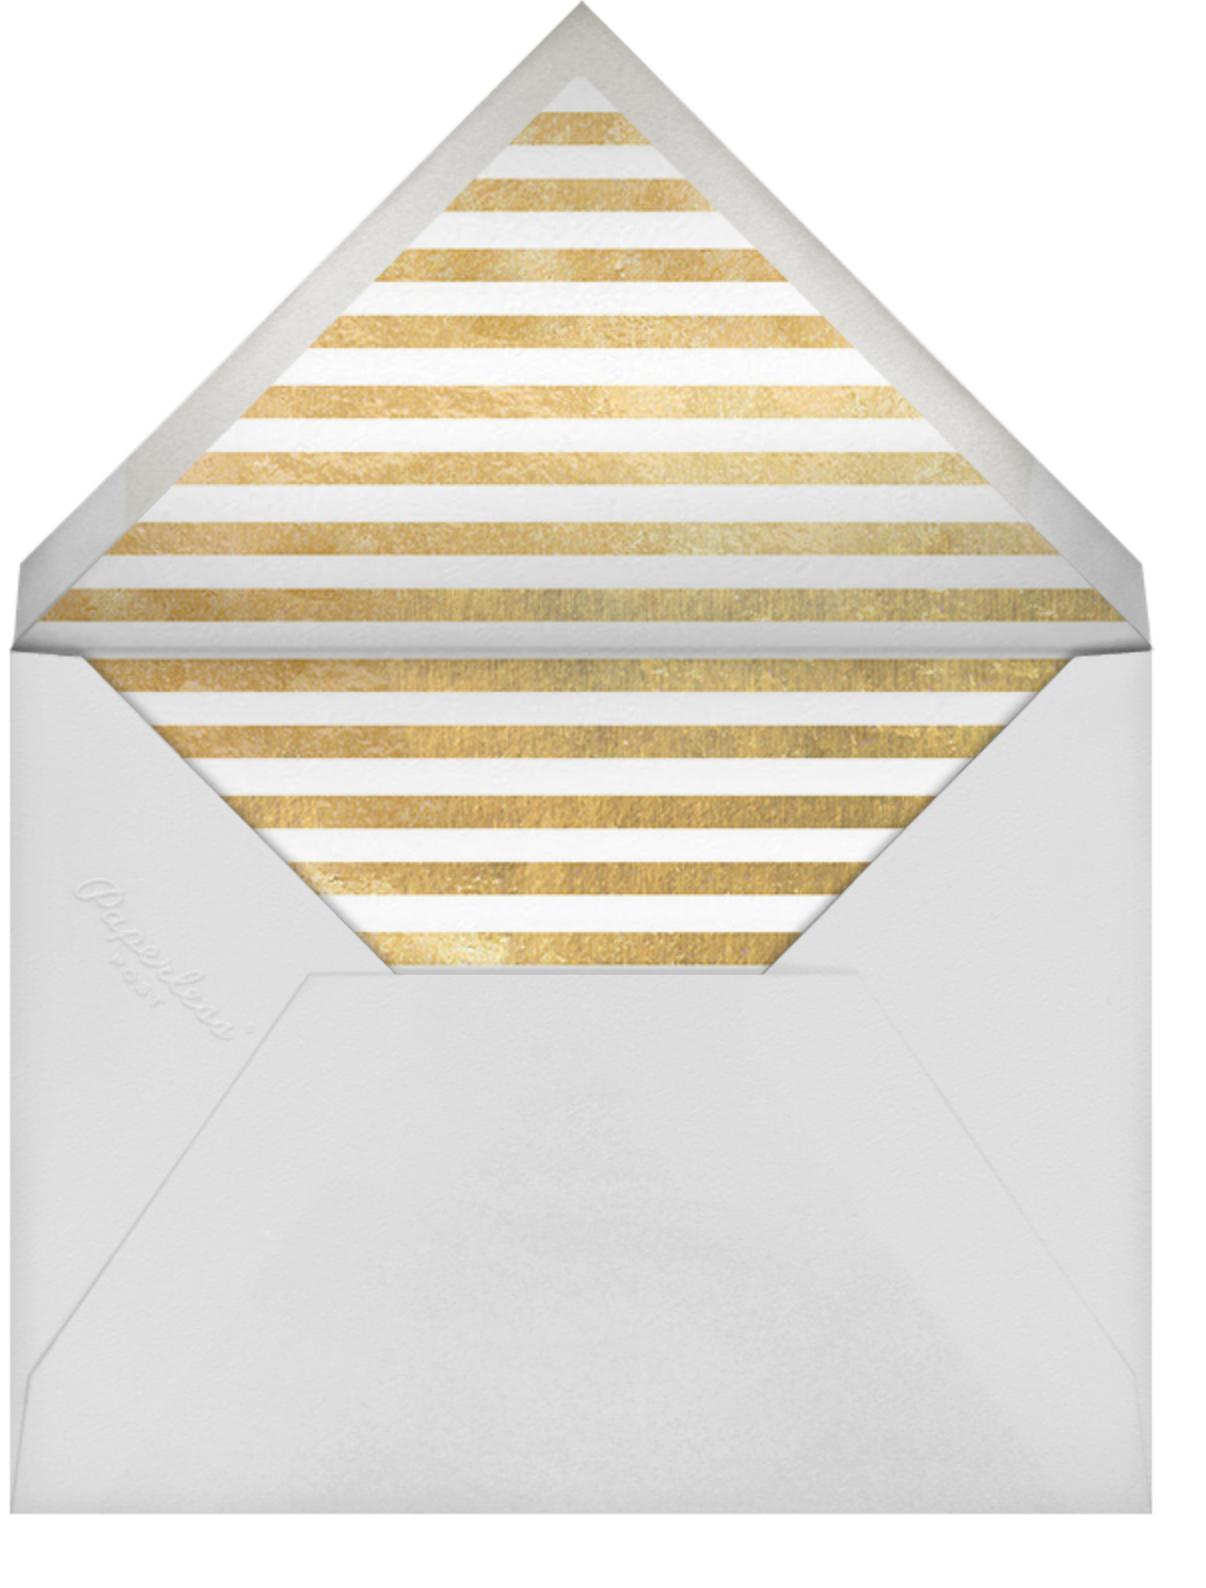 Come Celebrate - Bright Pink/Gold - kate spade new york - Birthday - envelope back